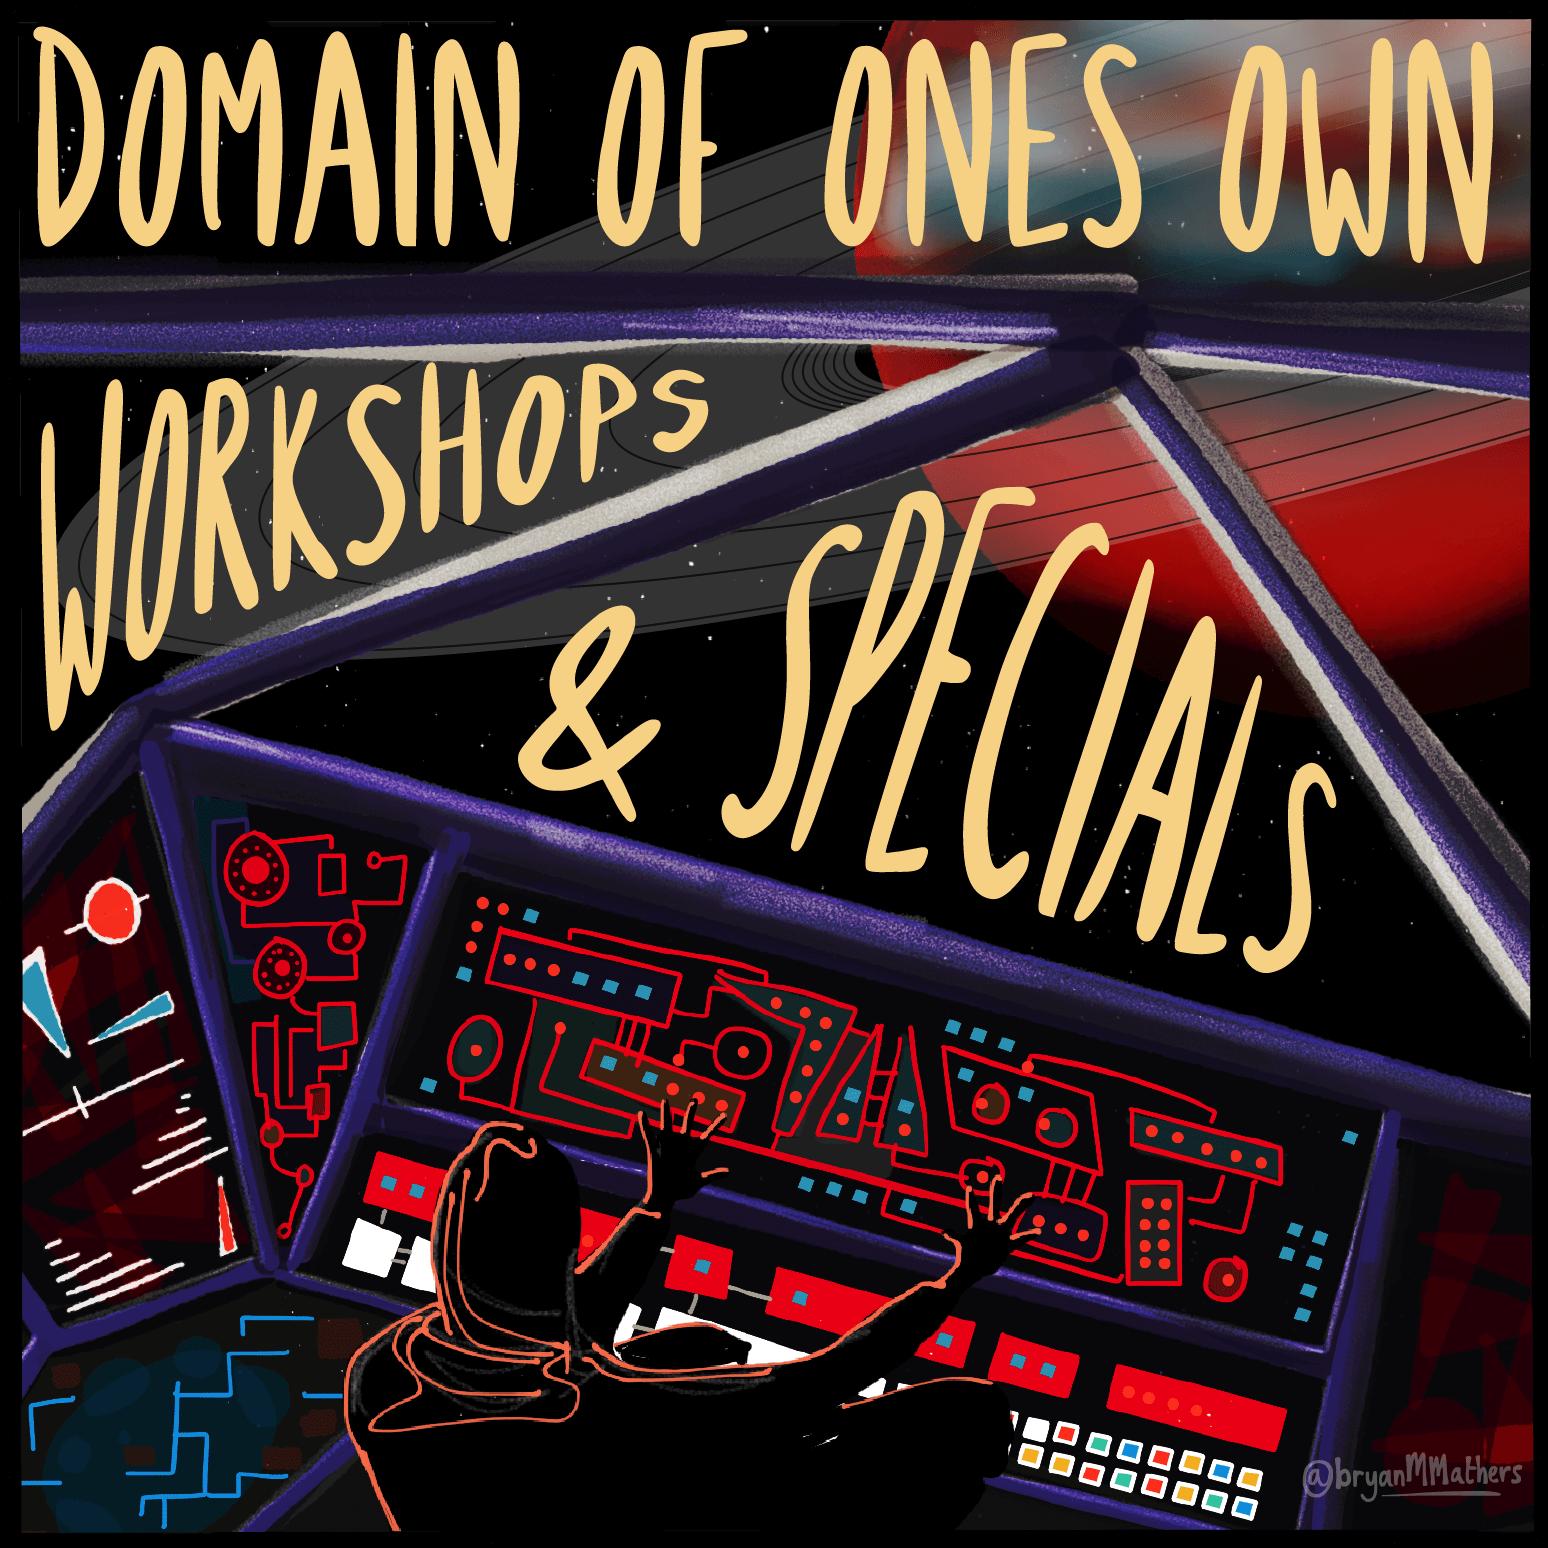 Workshops & Specials